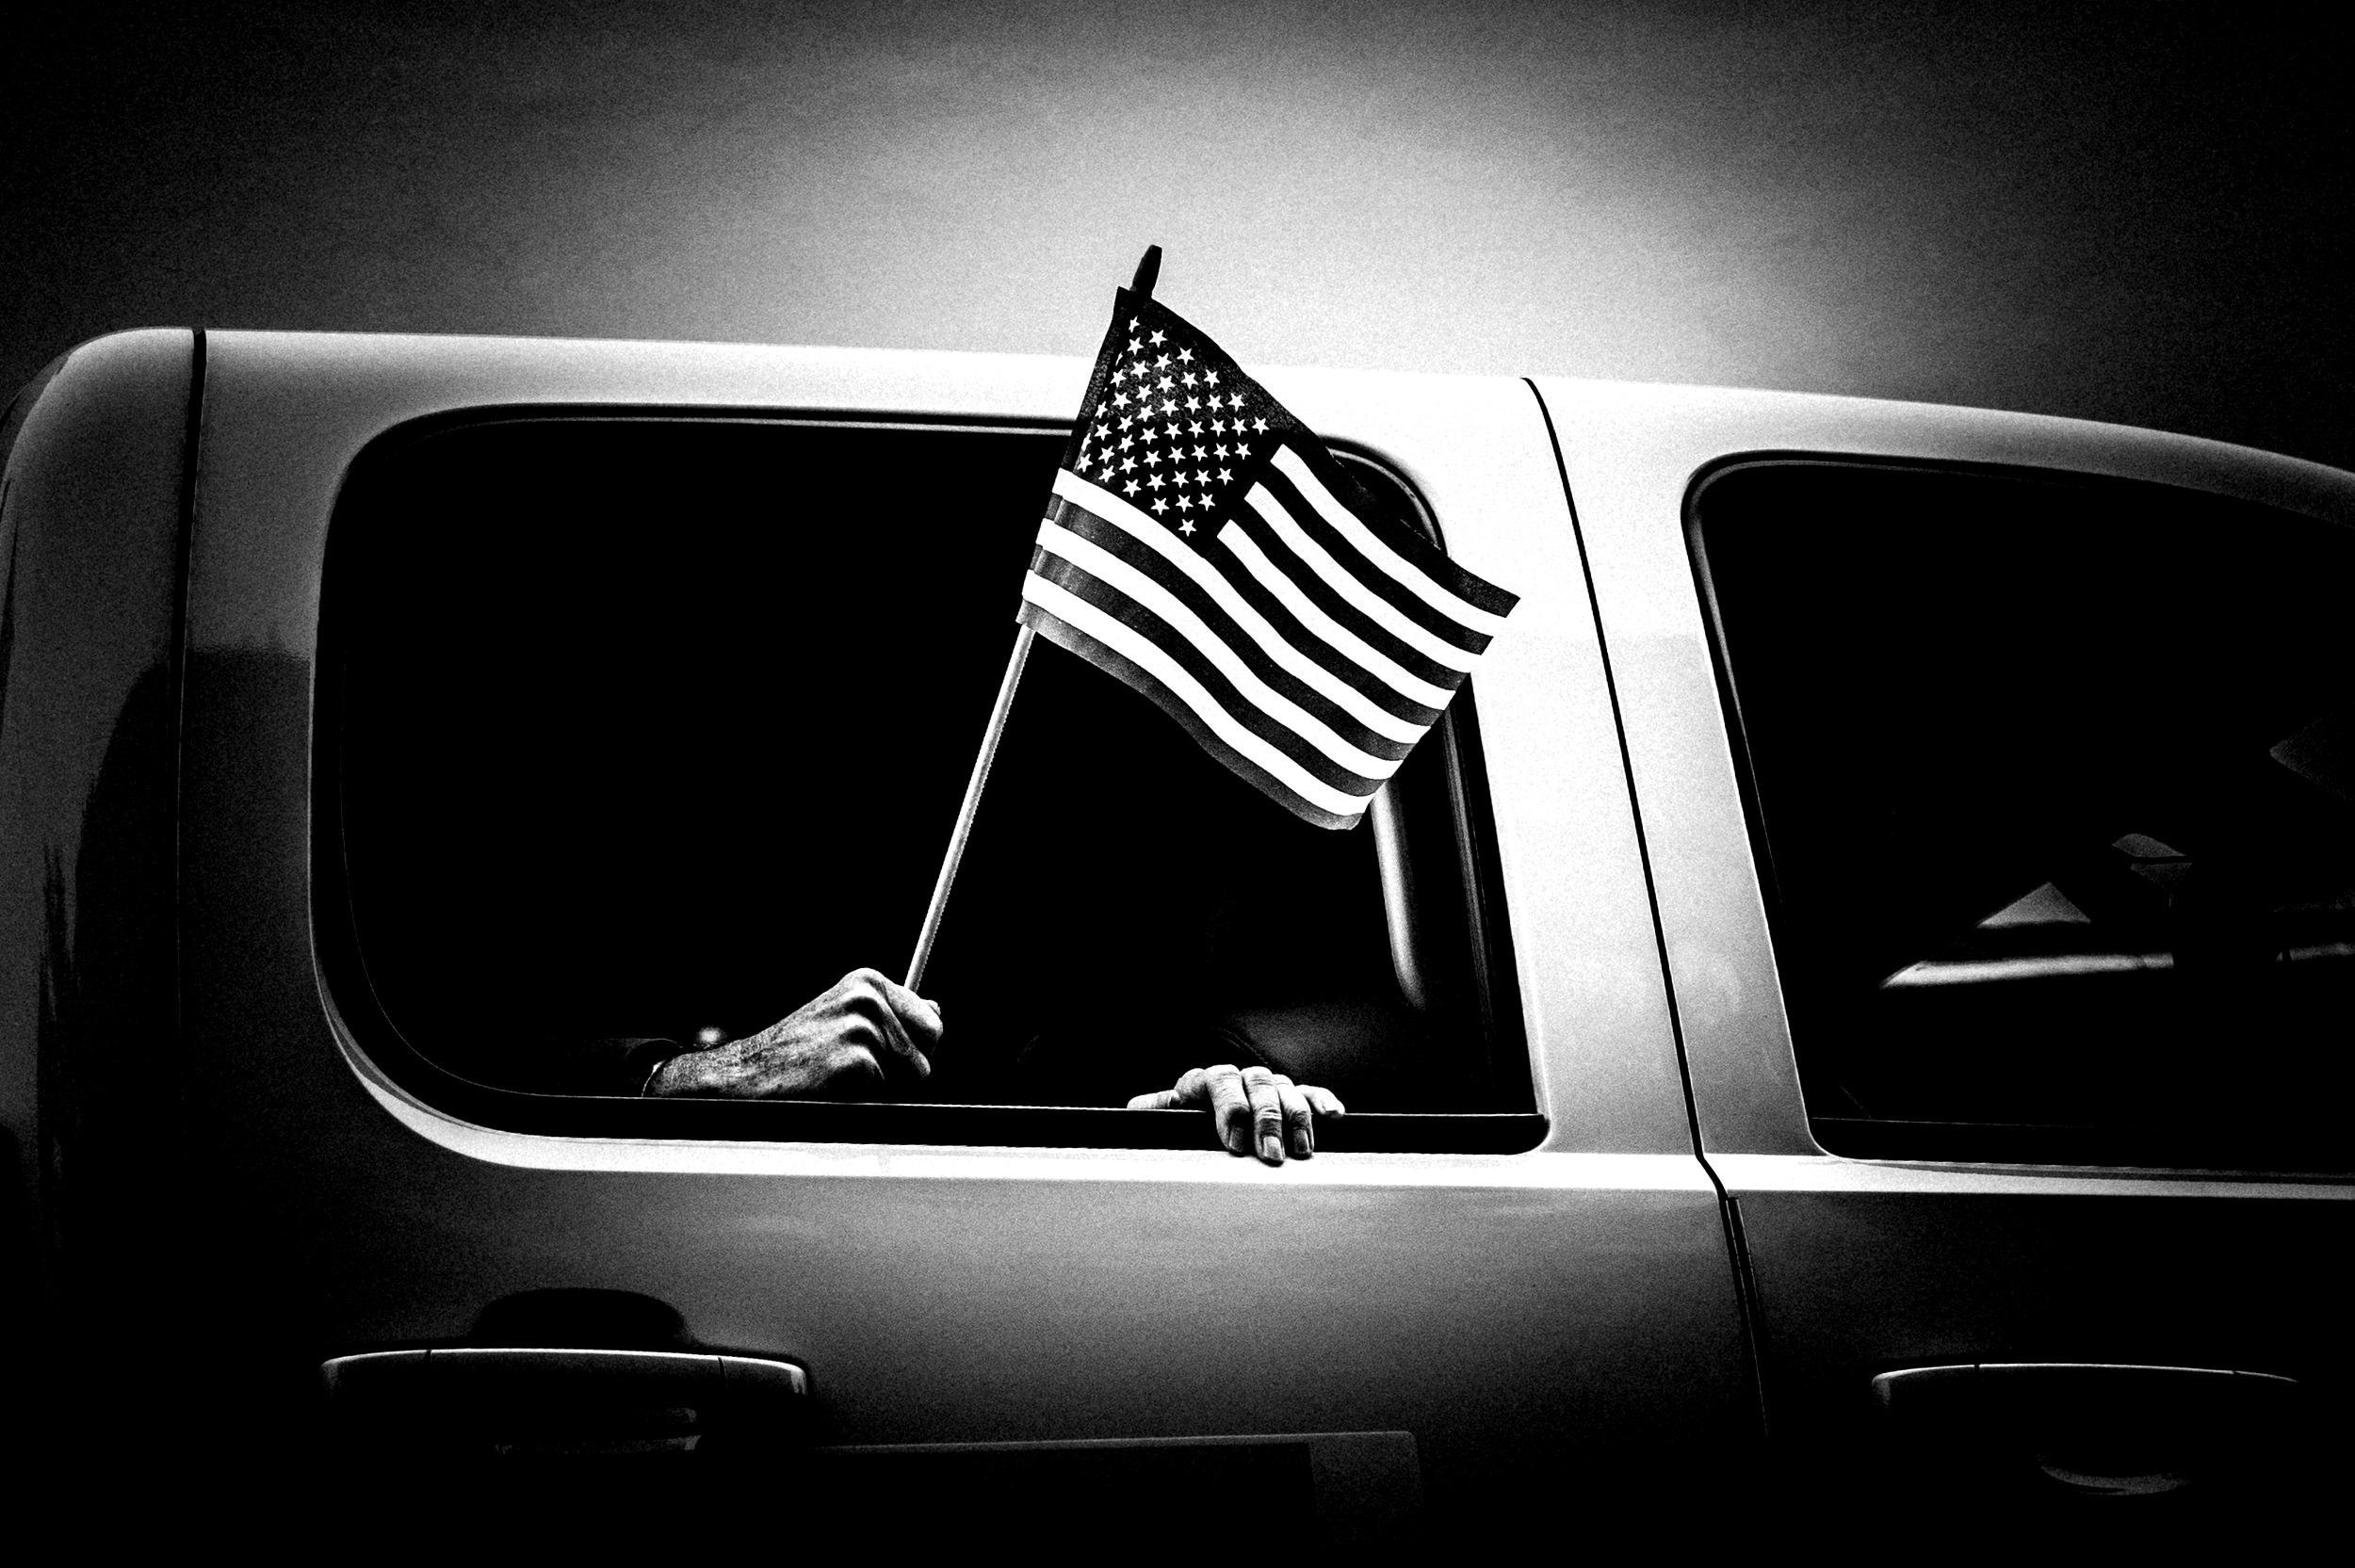 Veteran's Day Parade (Savannah, USA)